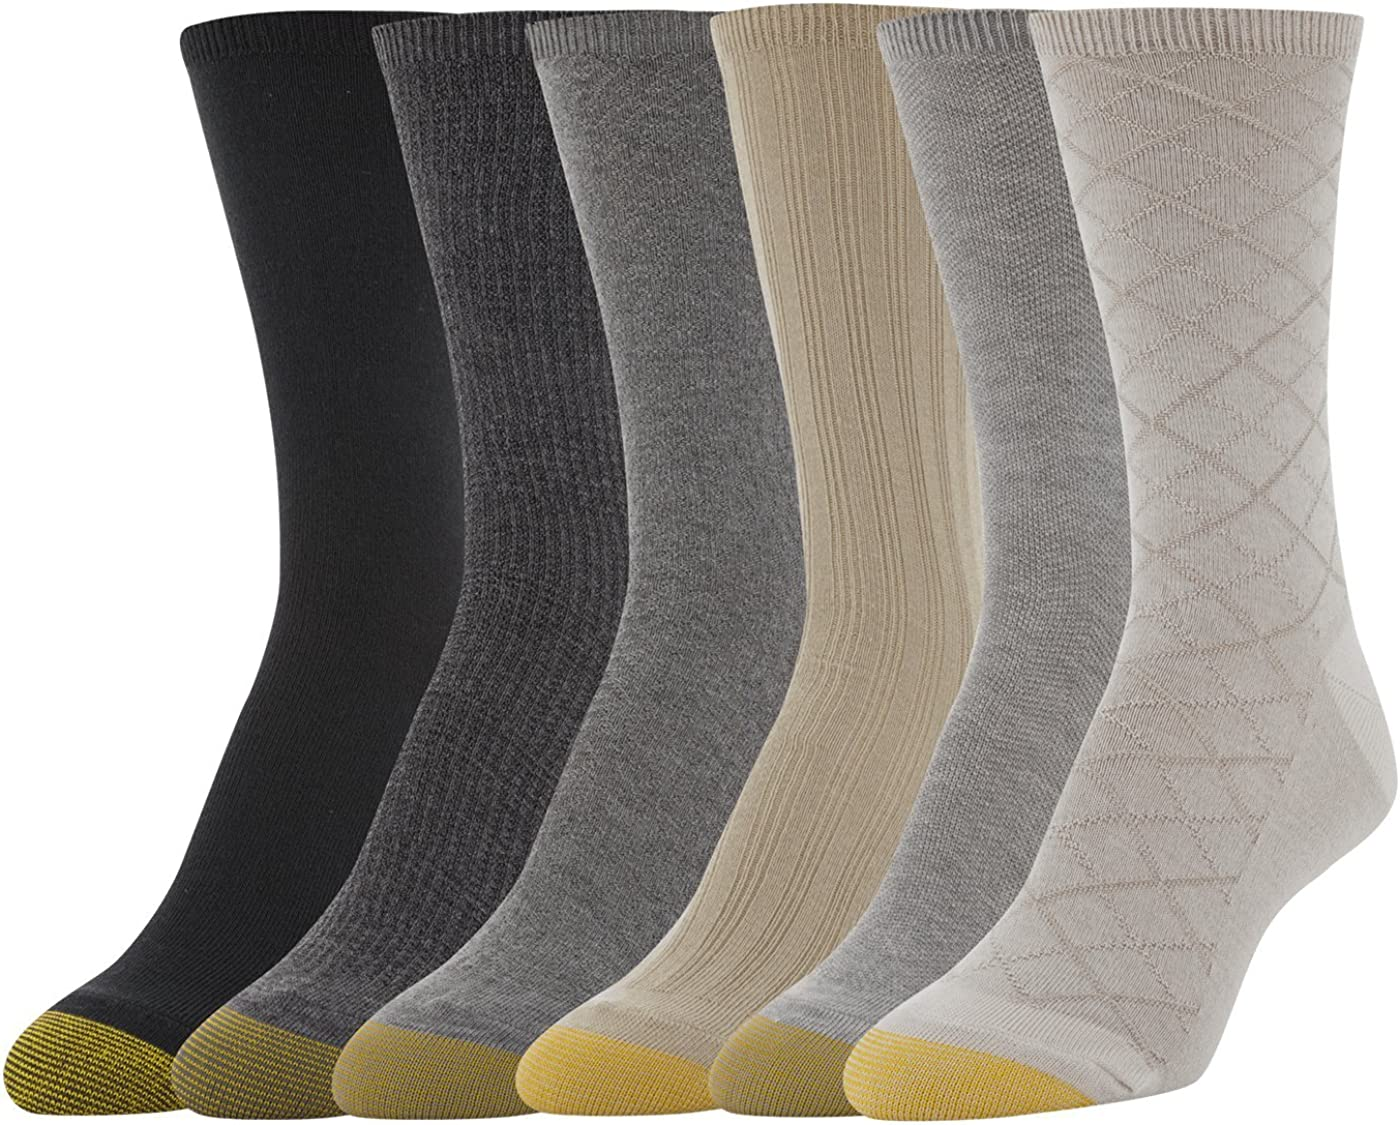 Gold Toe womens Casual Texture Crew Socks, 6 Pairs